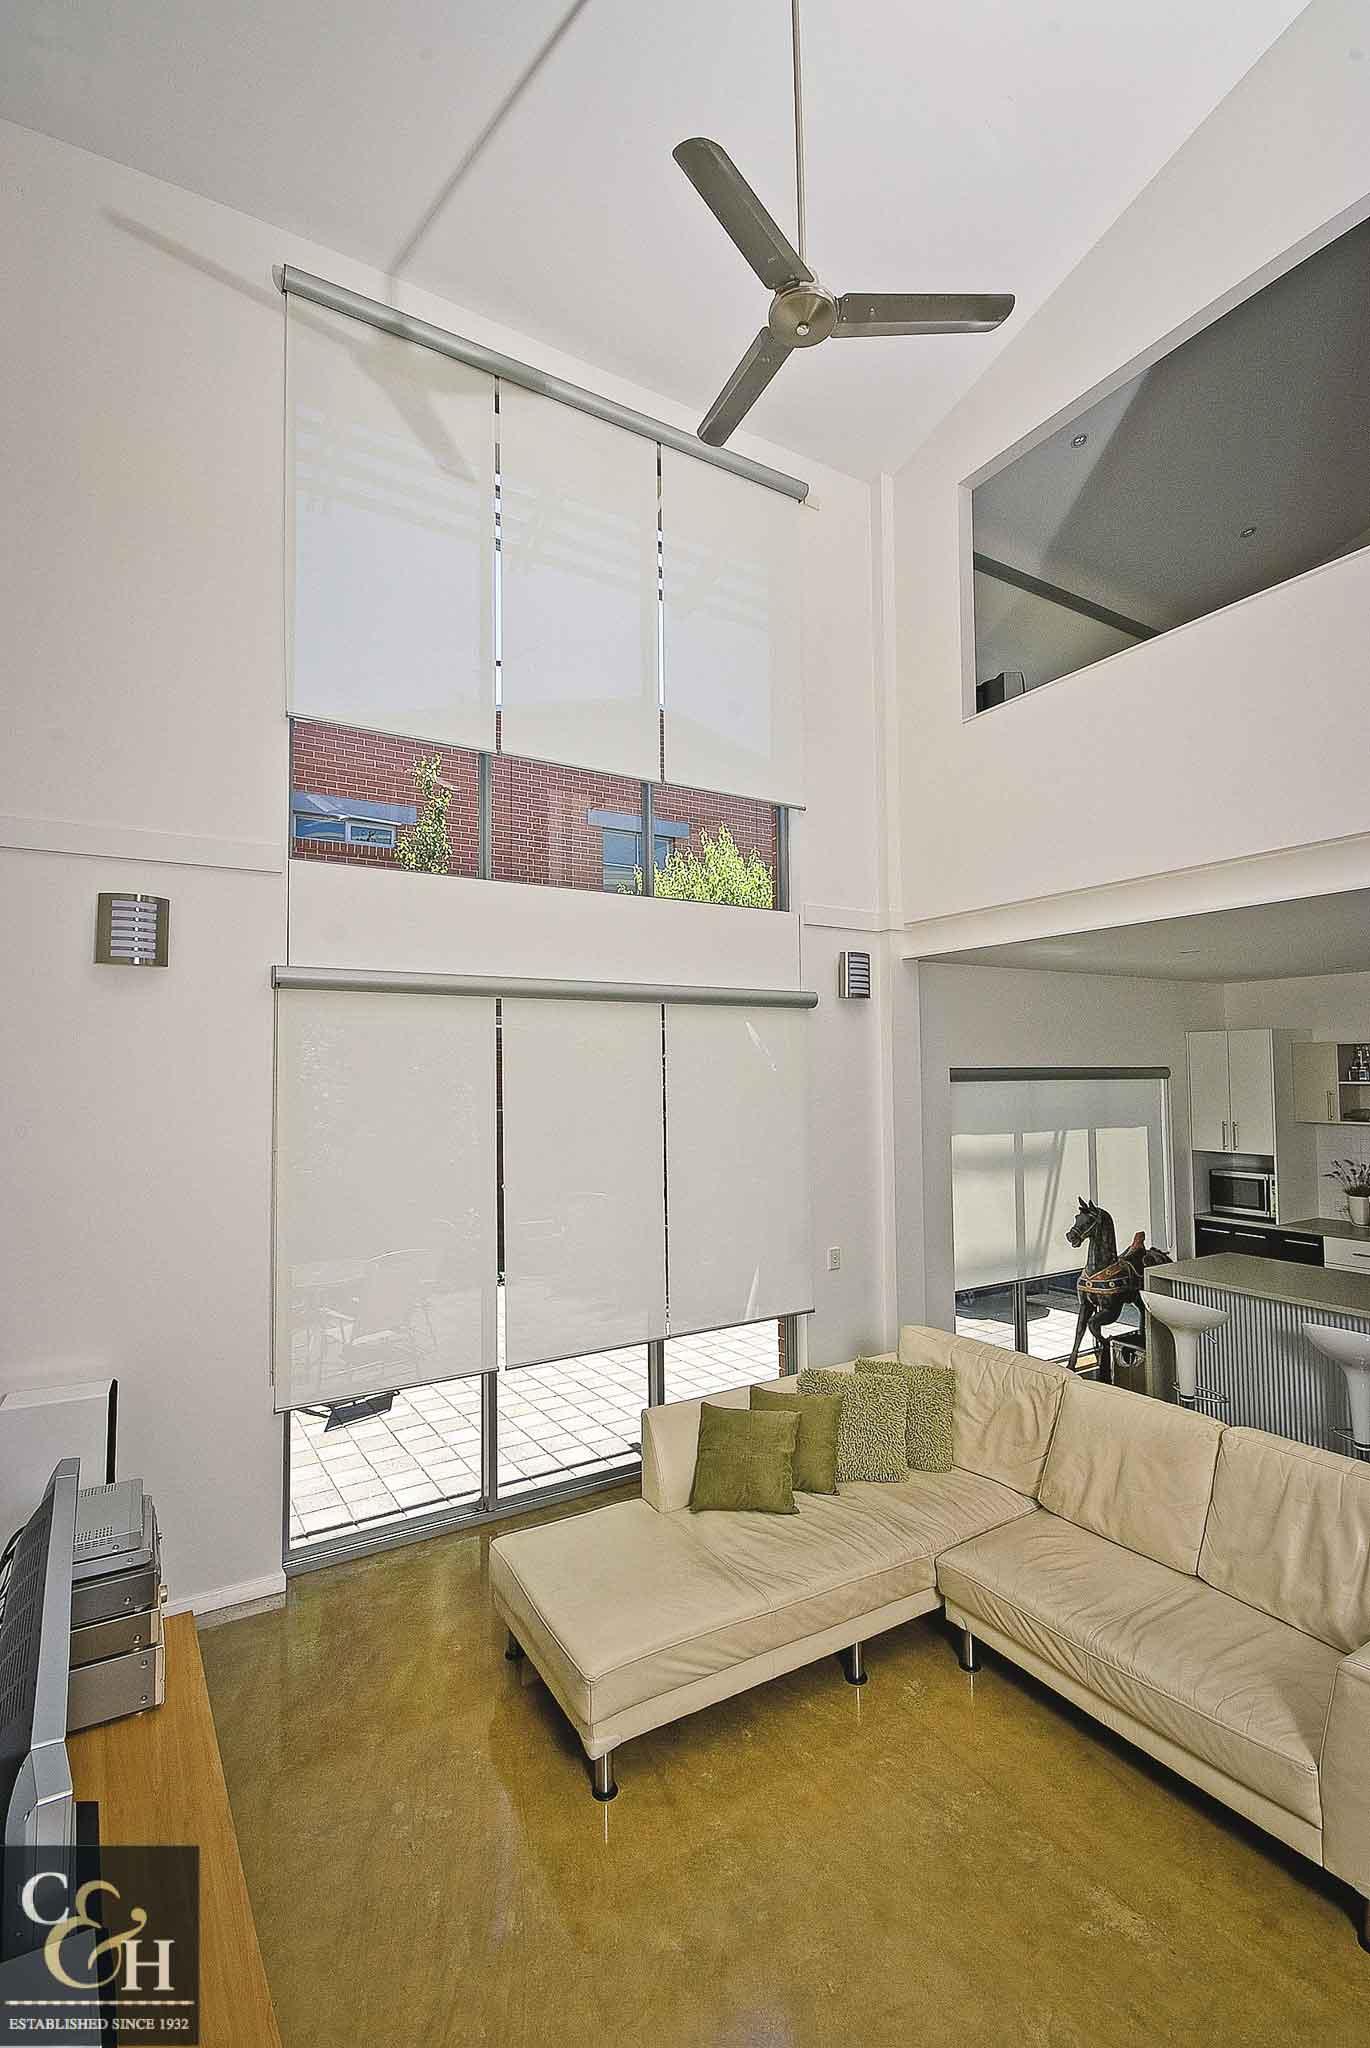 Screen-Roller-Blinds-4 inside a living room